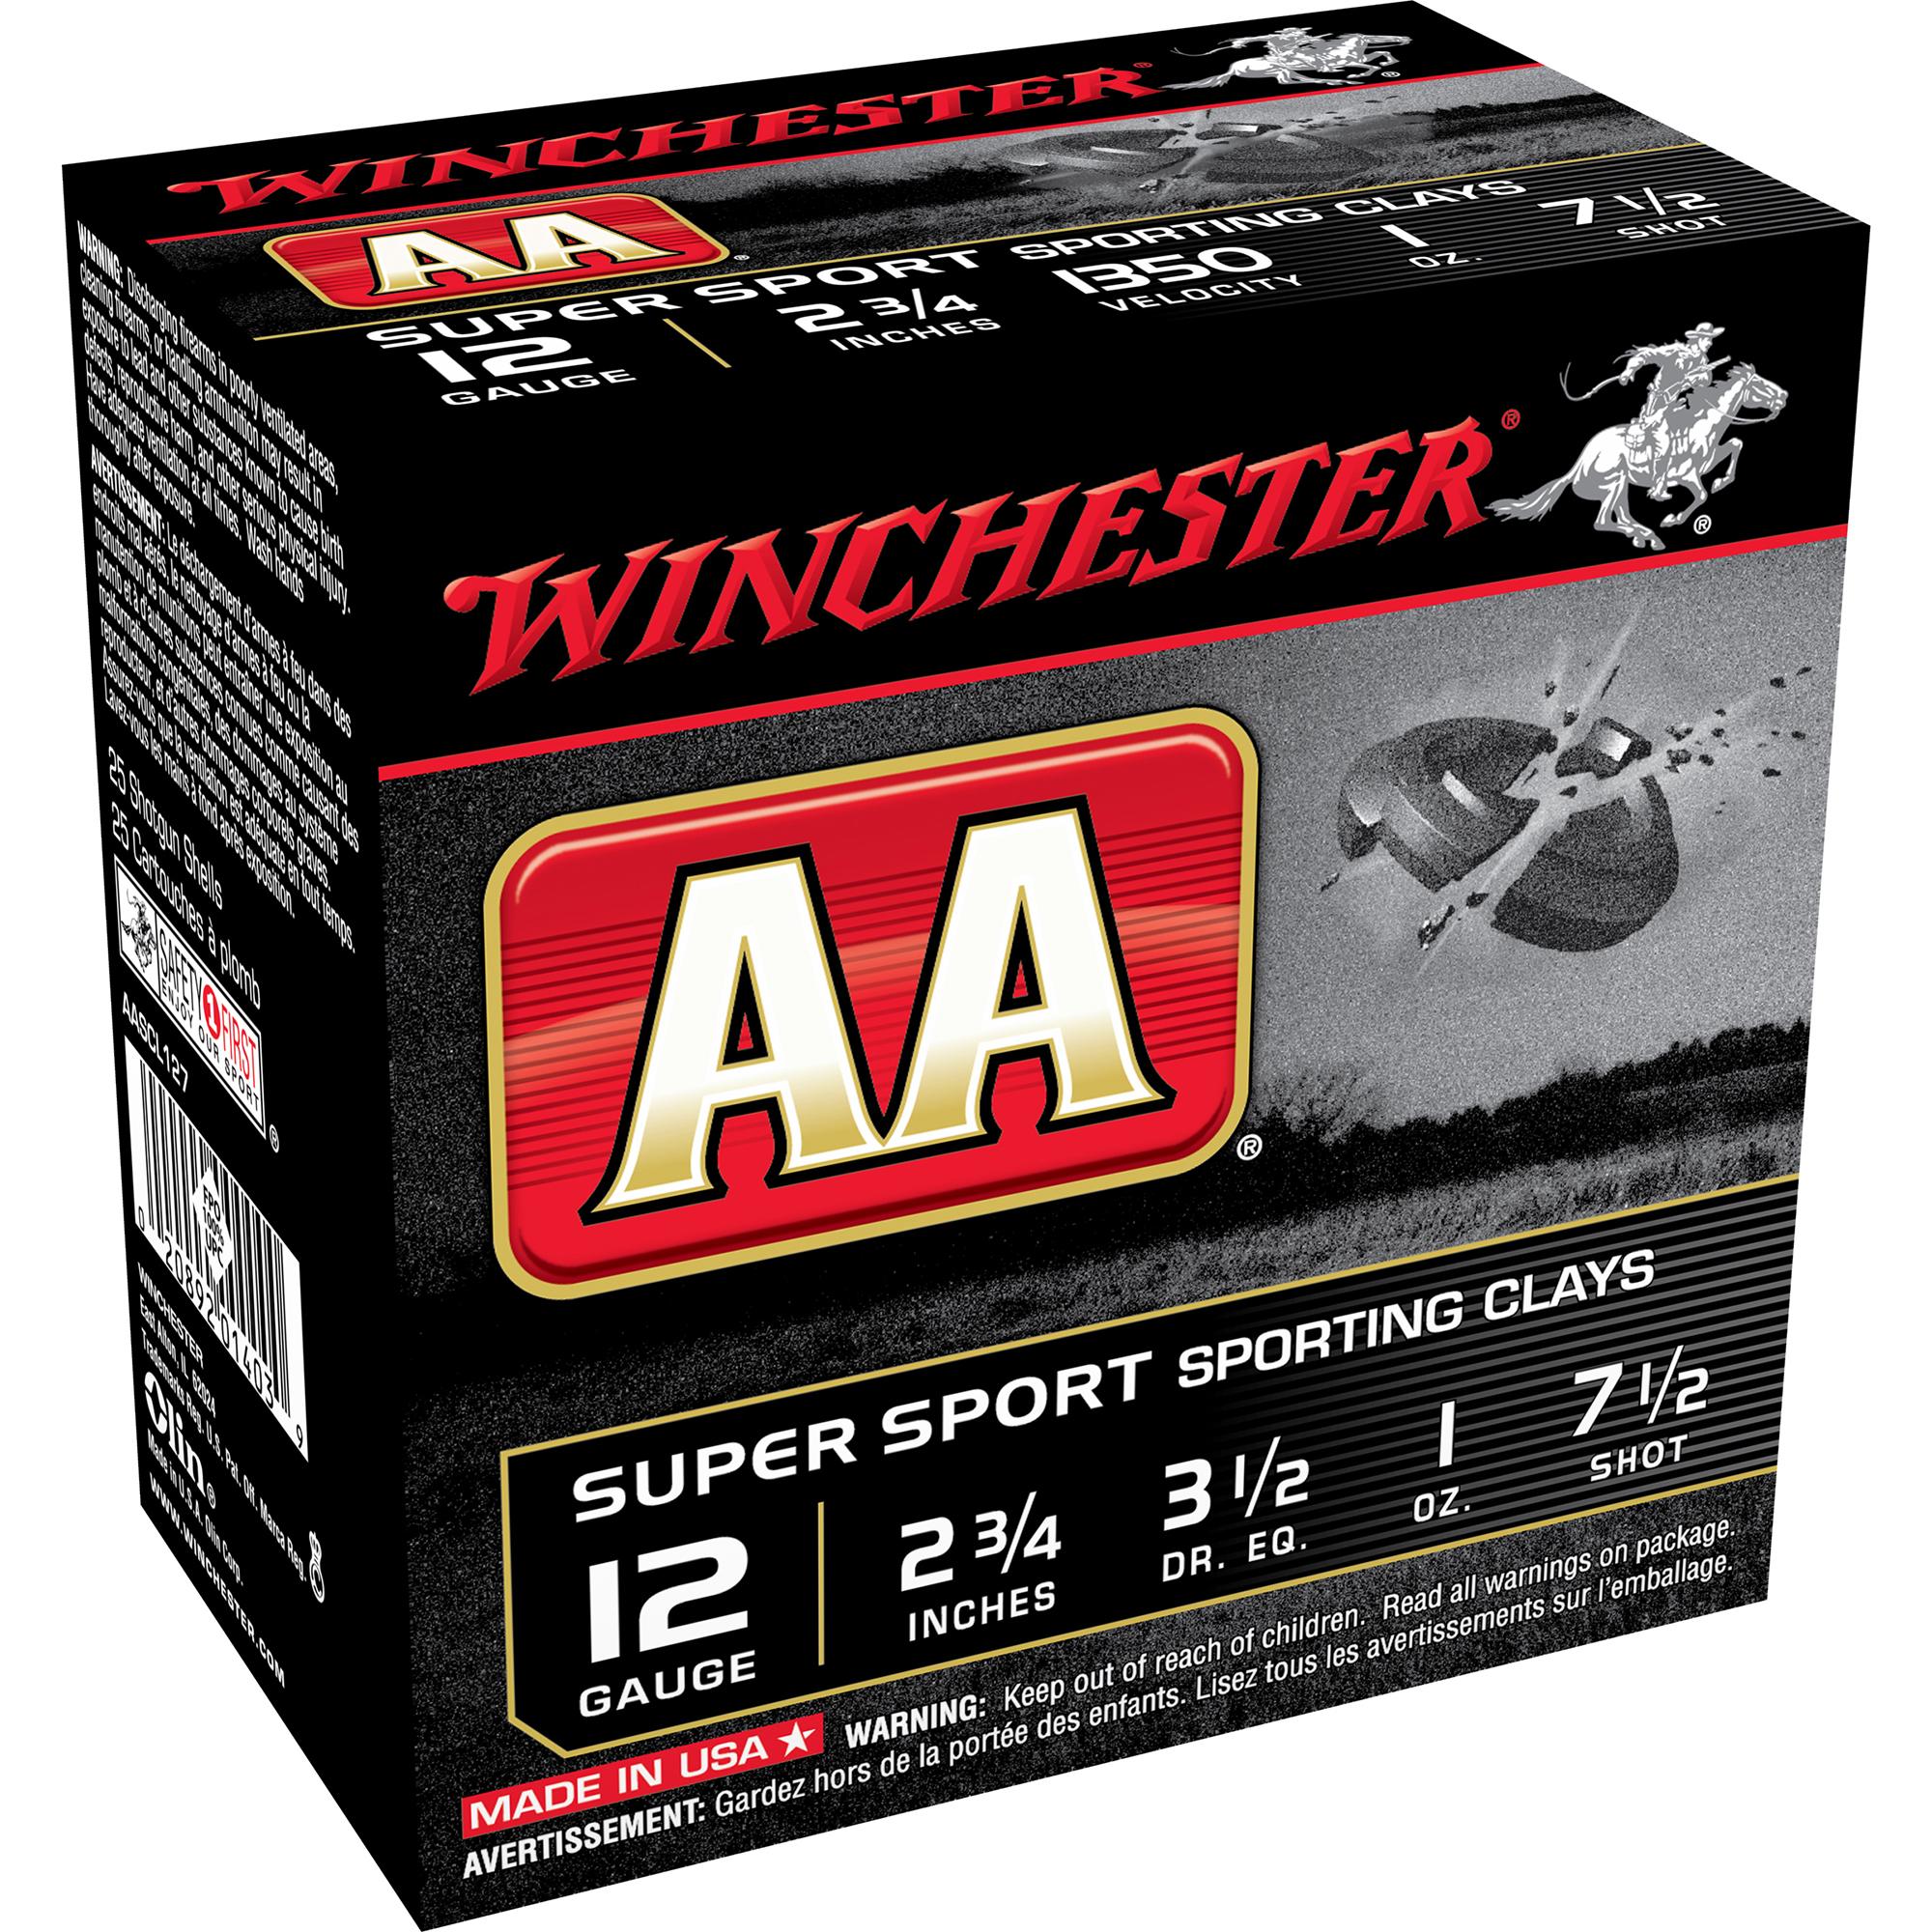 Winchester AA Super Sport Target Loads, 12-ga, 2-3/4″, 1 oz, #7.5, 8